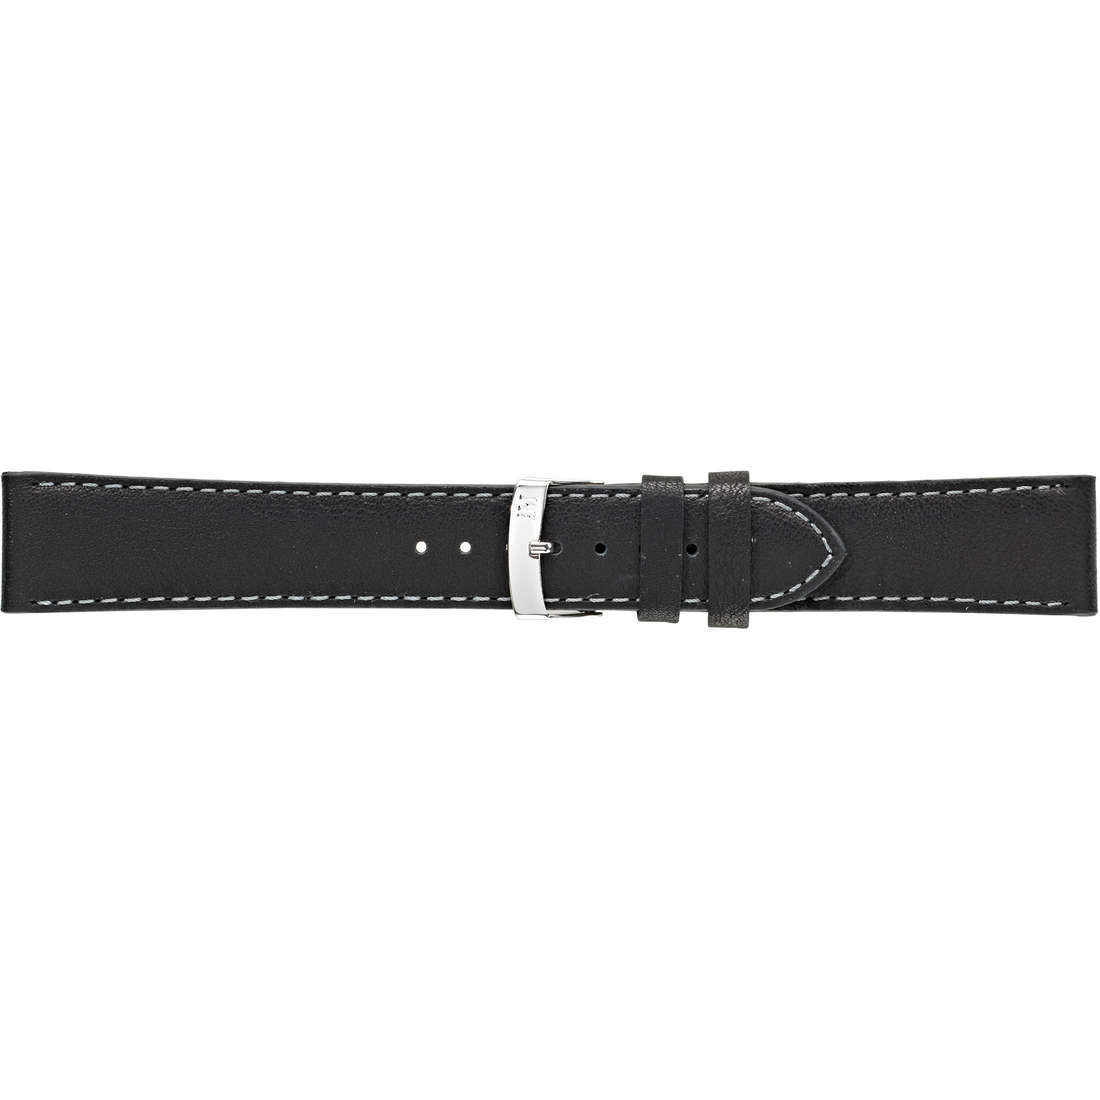 watch watch bands watch straps man Morellato Performance A01X3688A37019CR16